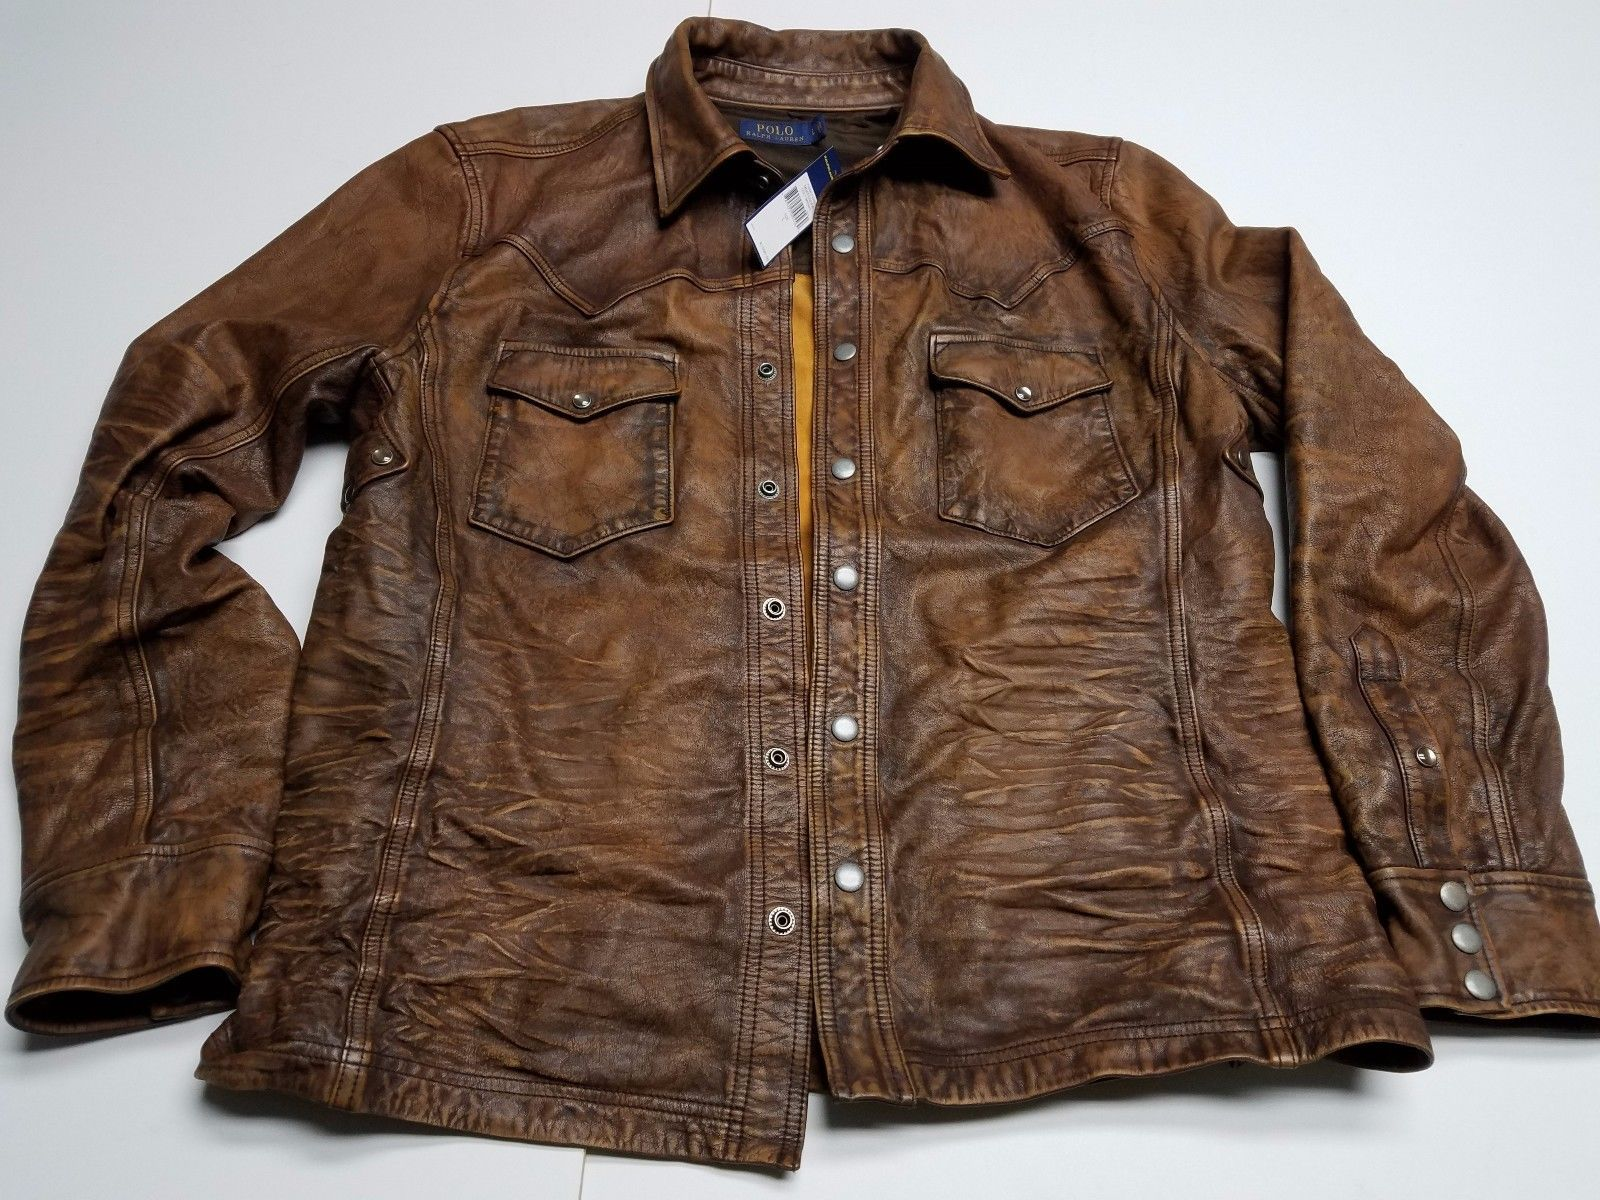 1,595 POLO Ralph Lauren Brown Defender Leather Jacket